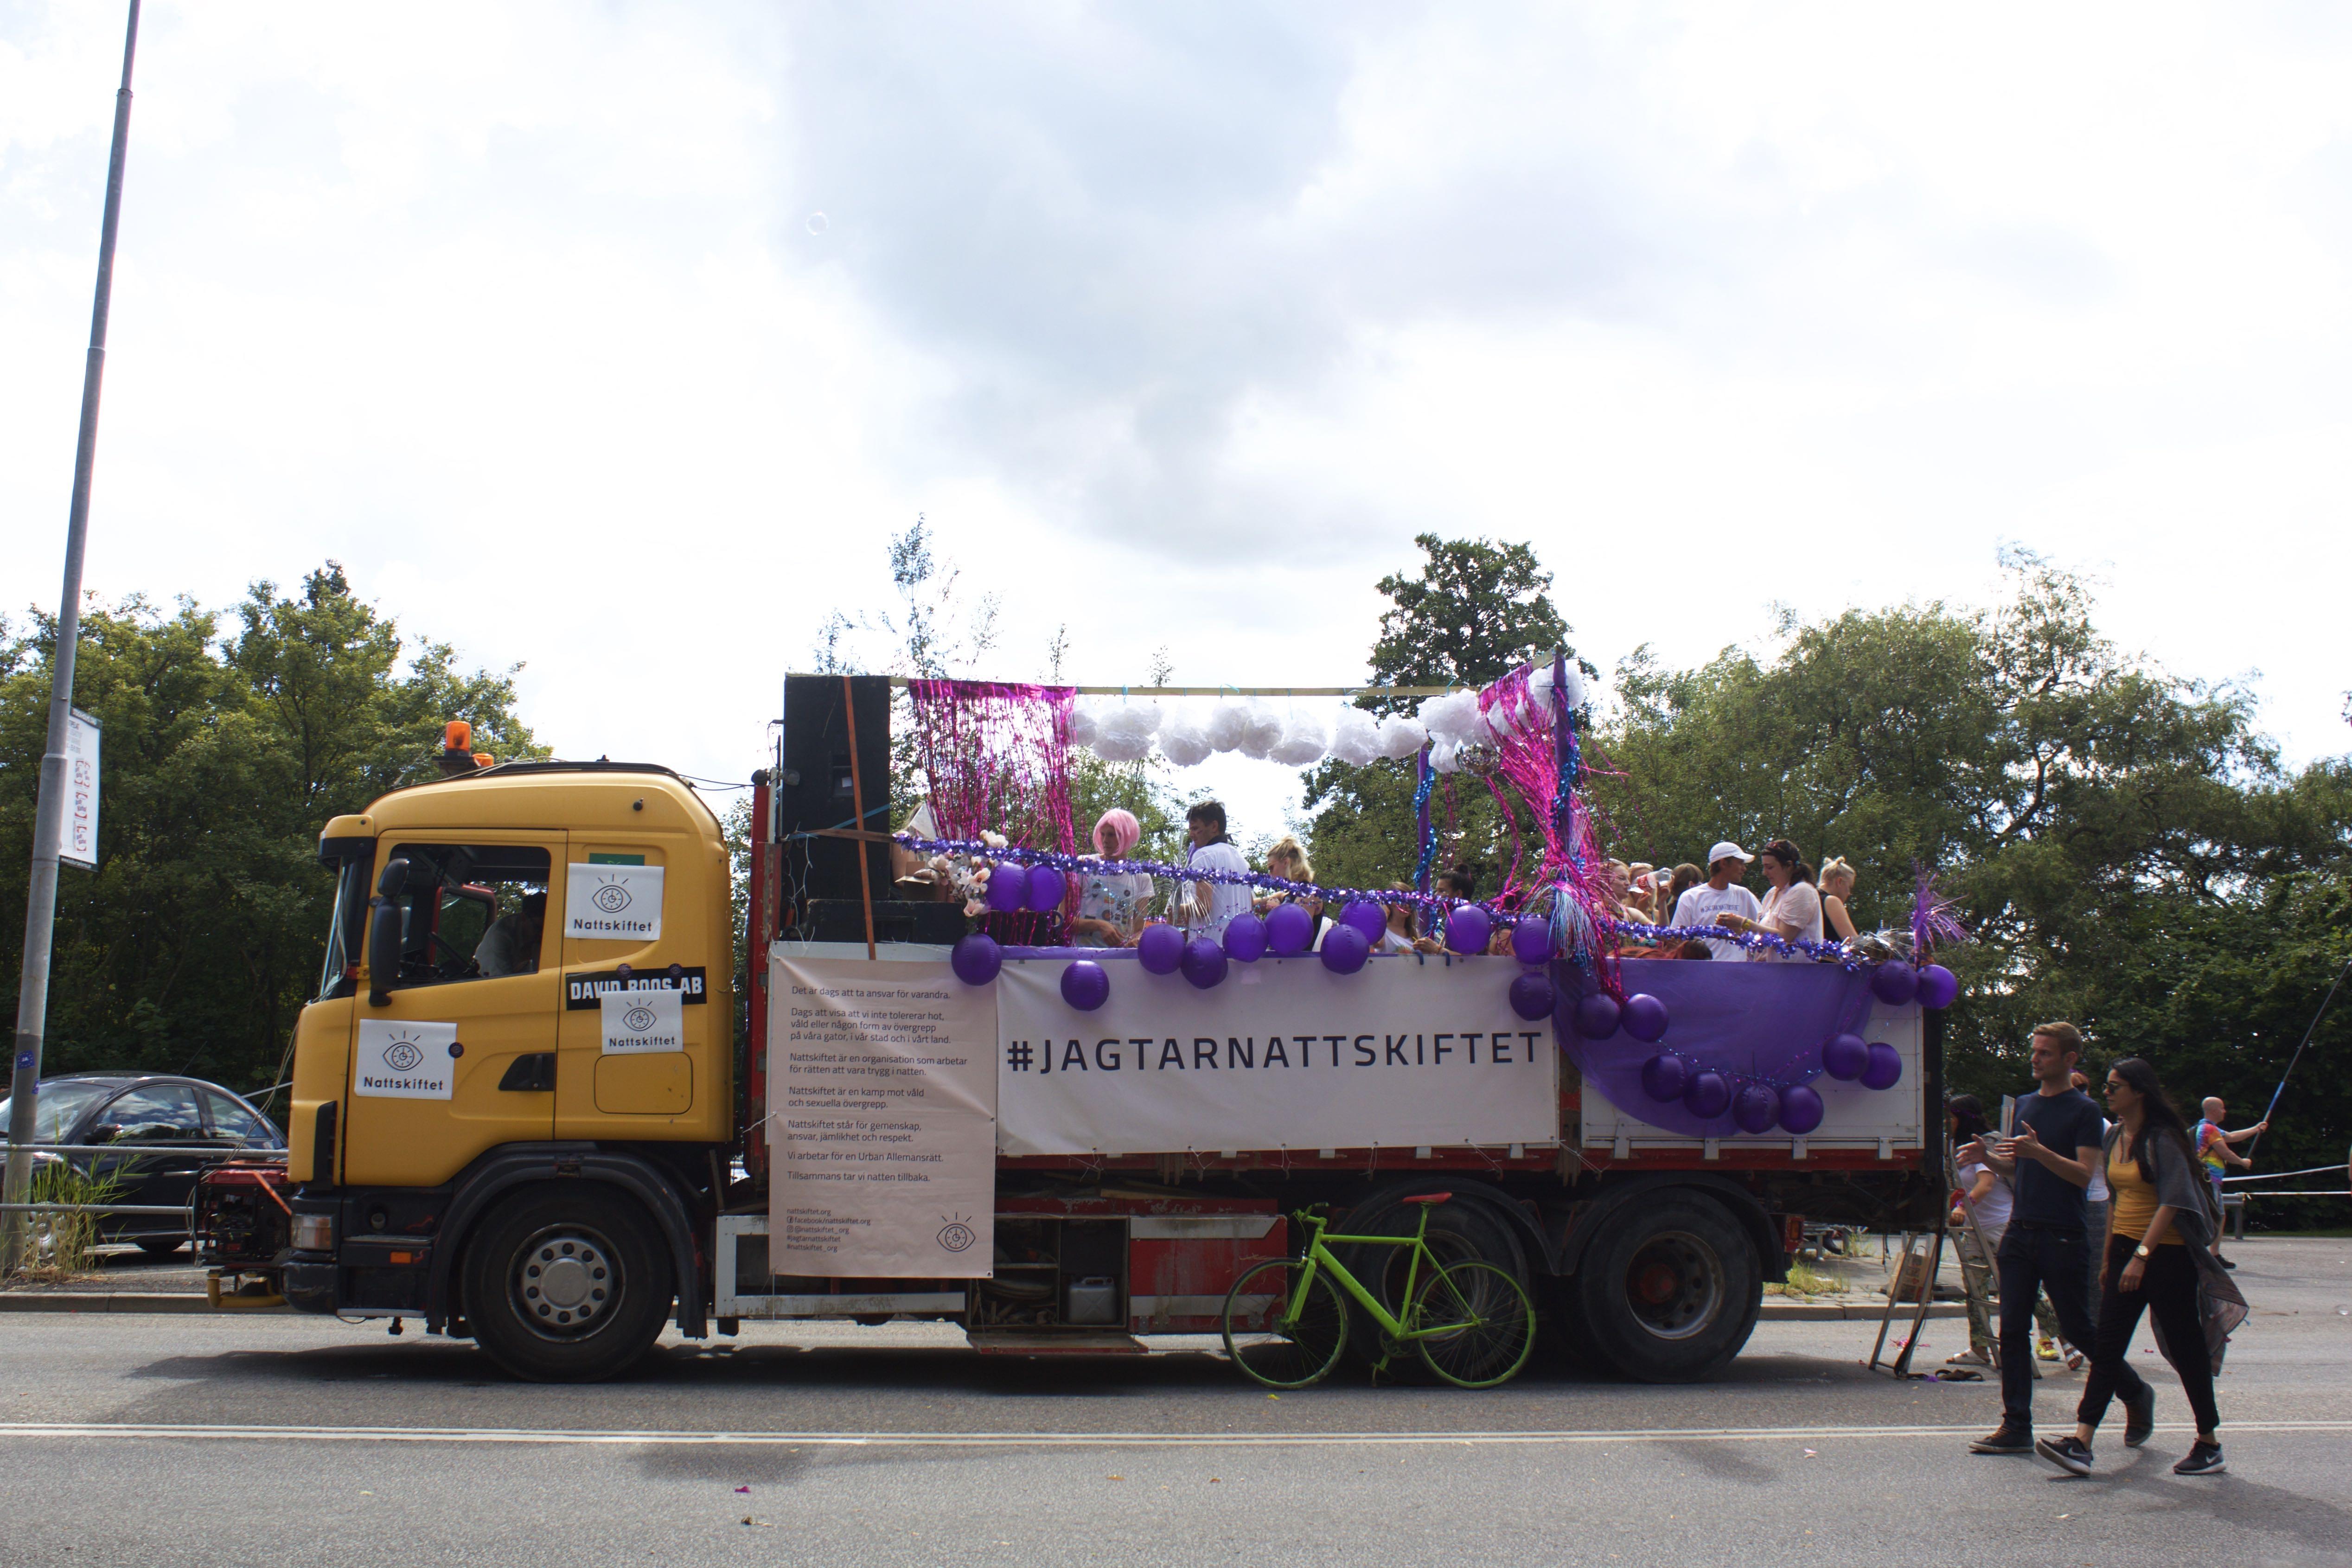 Stockholm Pride #Jagtarnattskiftet